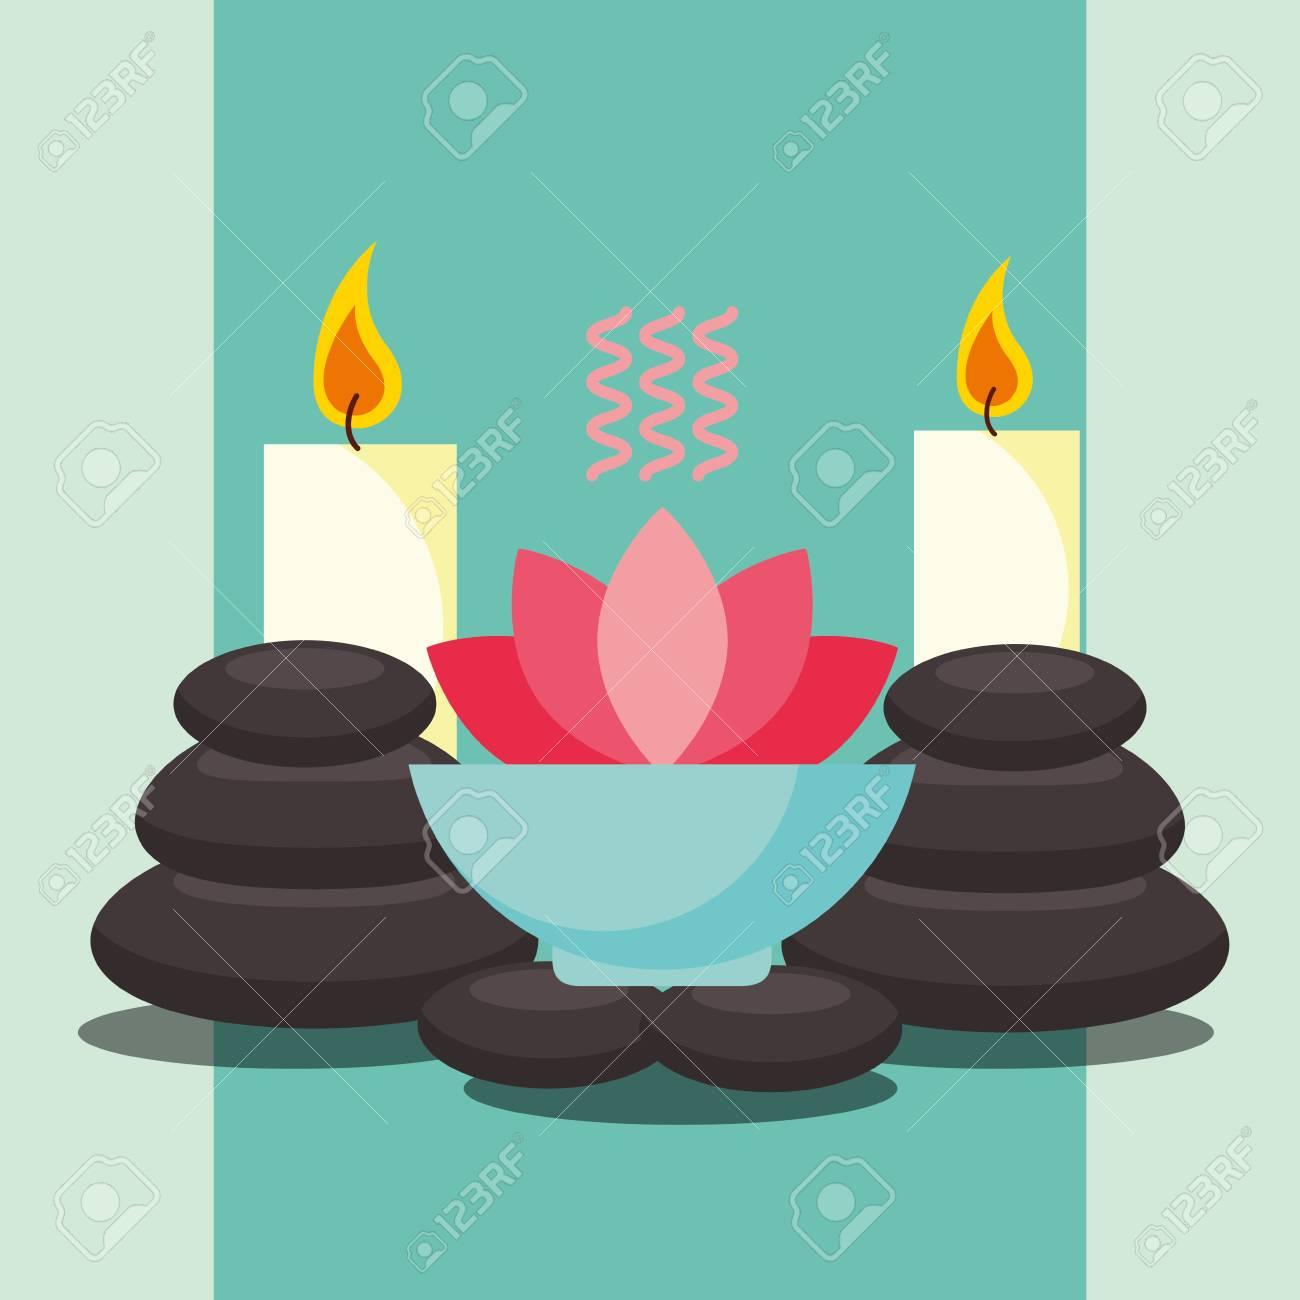 Aromatherapy Lotus Flower Massage Stone And Candles Spa Wellness